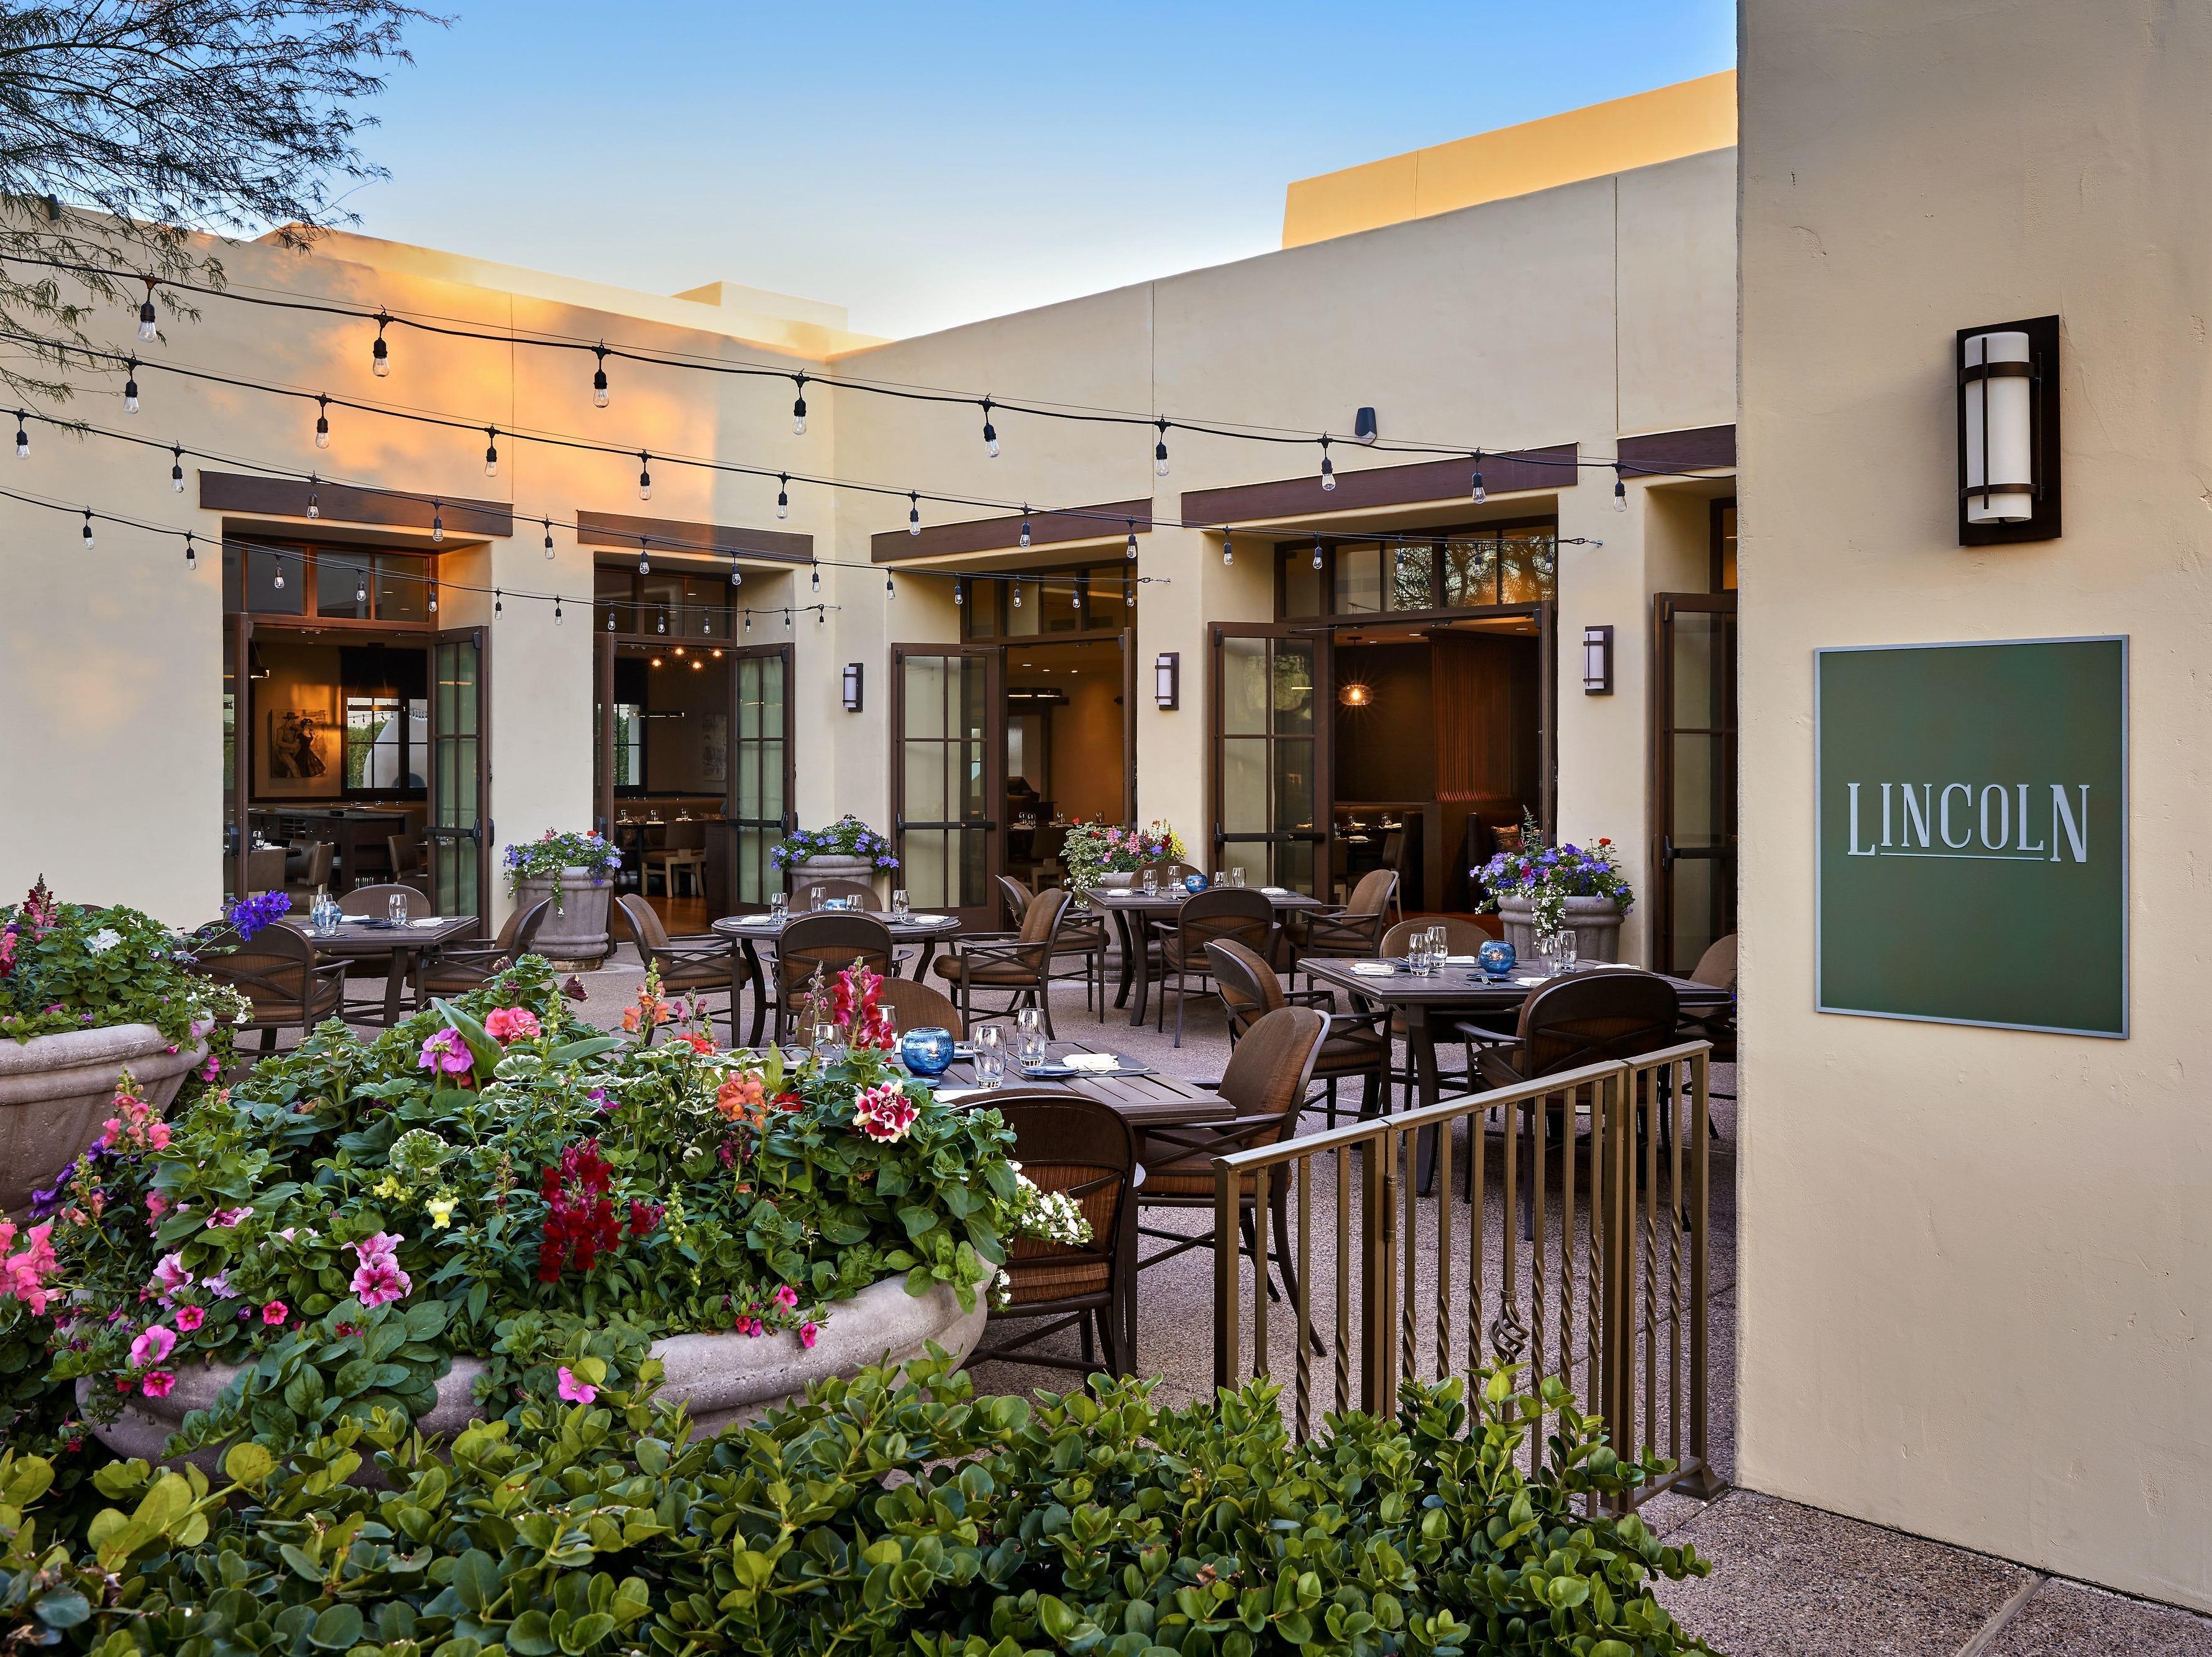 No. 38 (tie): Marriott International Inc. | Hotels, resorts, timeshares | 2019 employees: 4,500e (estimated by Arizona Republic) | 2018 employees: 6,491 | Ownership: Public | Headquarters: Bethesda, Maryland | www.marriott.com